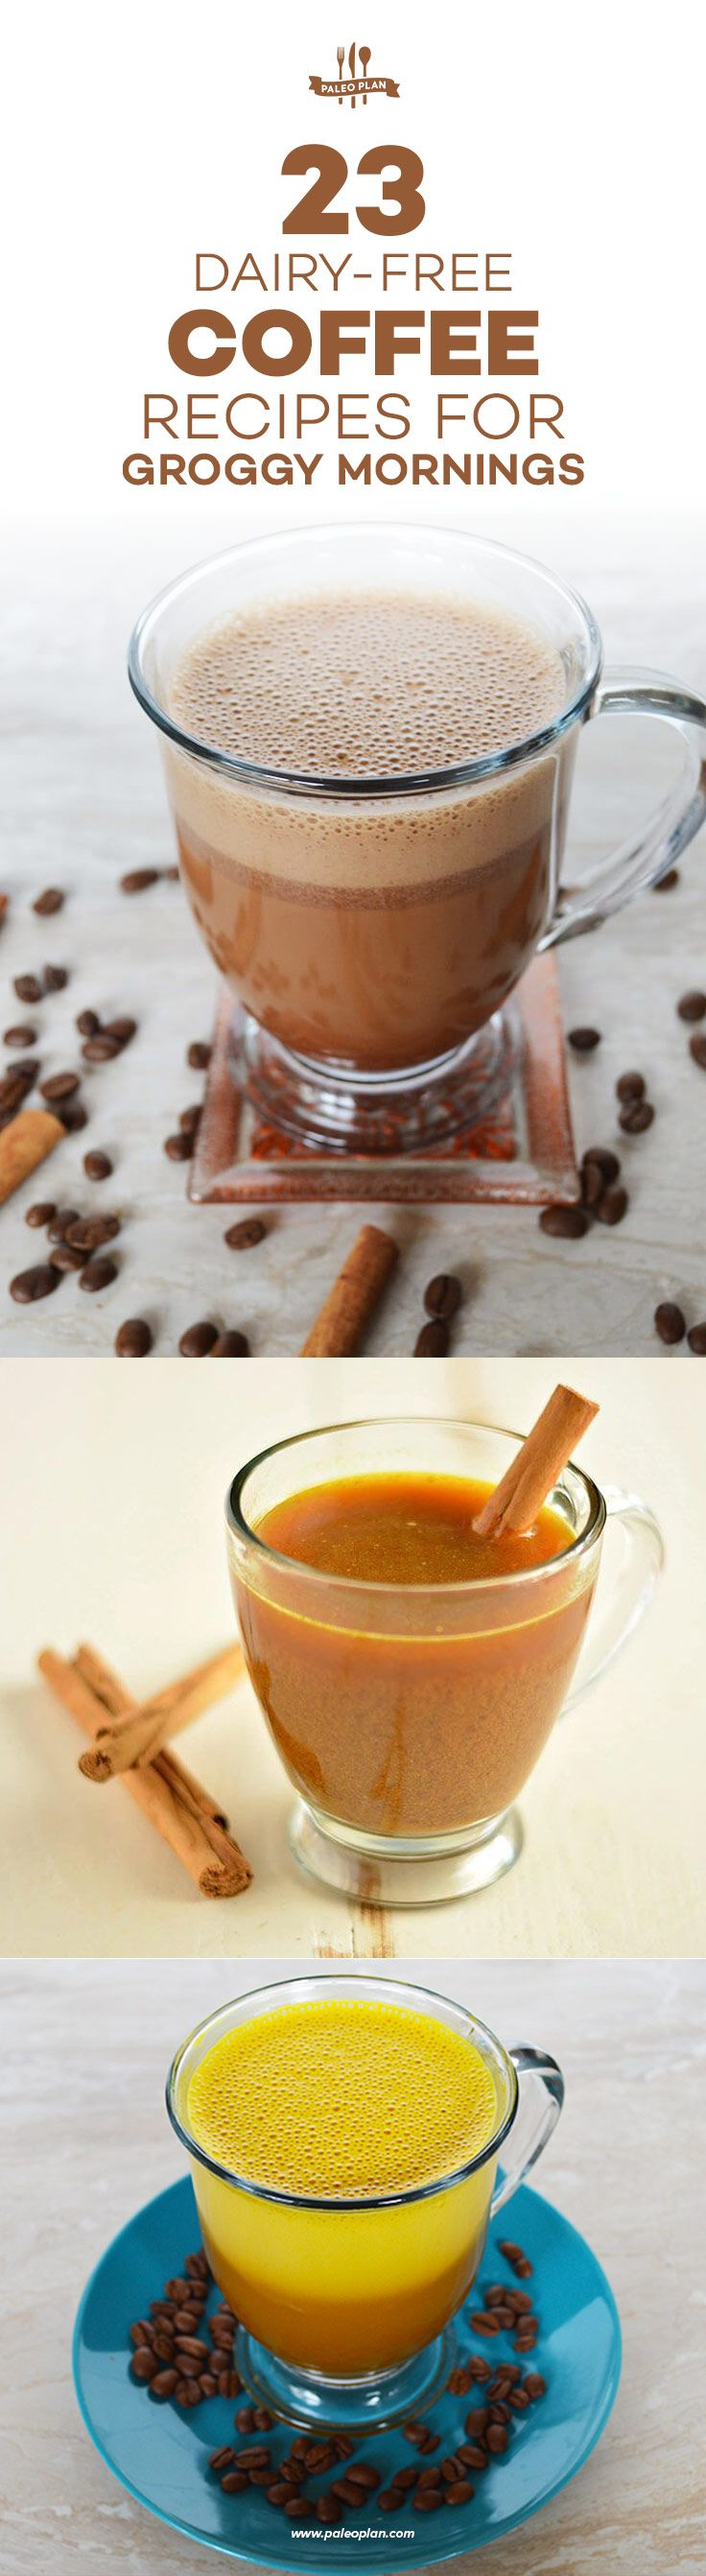 23 DairyFree Coffee Recipes for Groggy Mornings Coffee